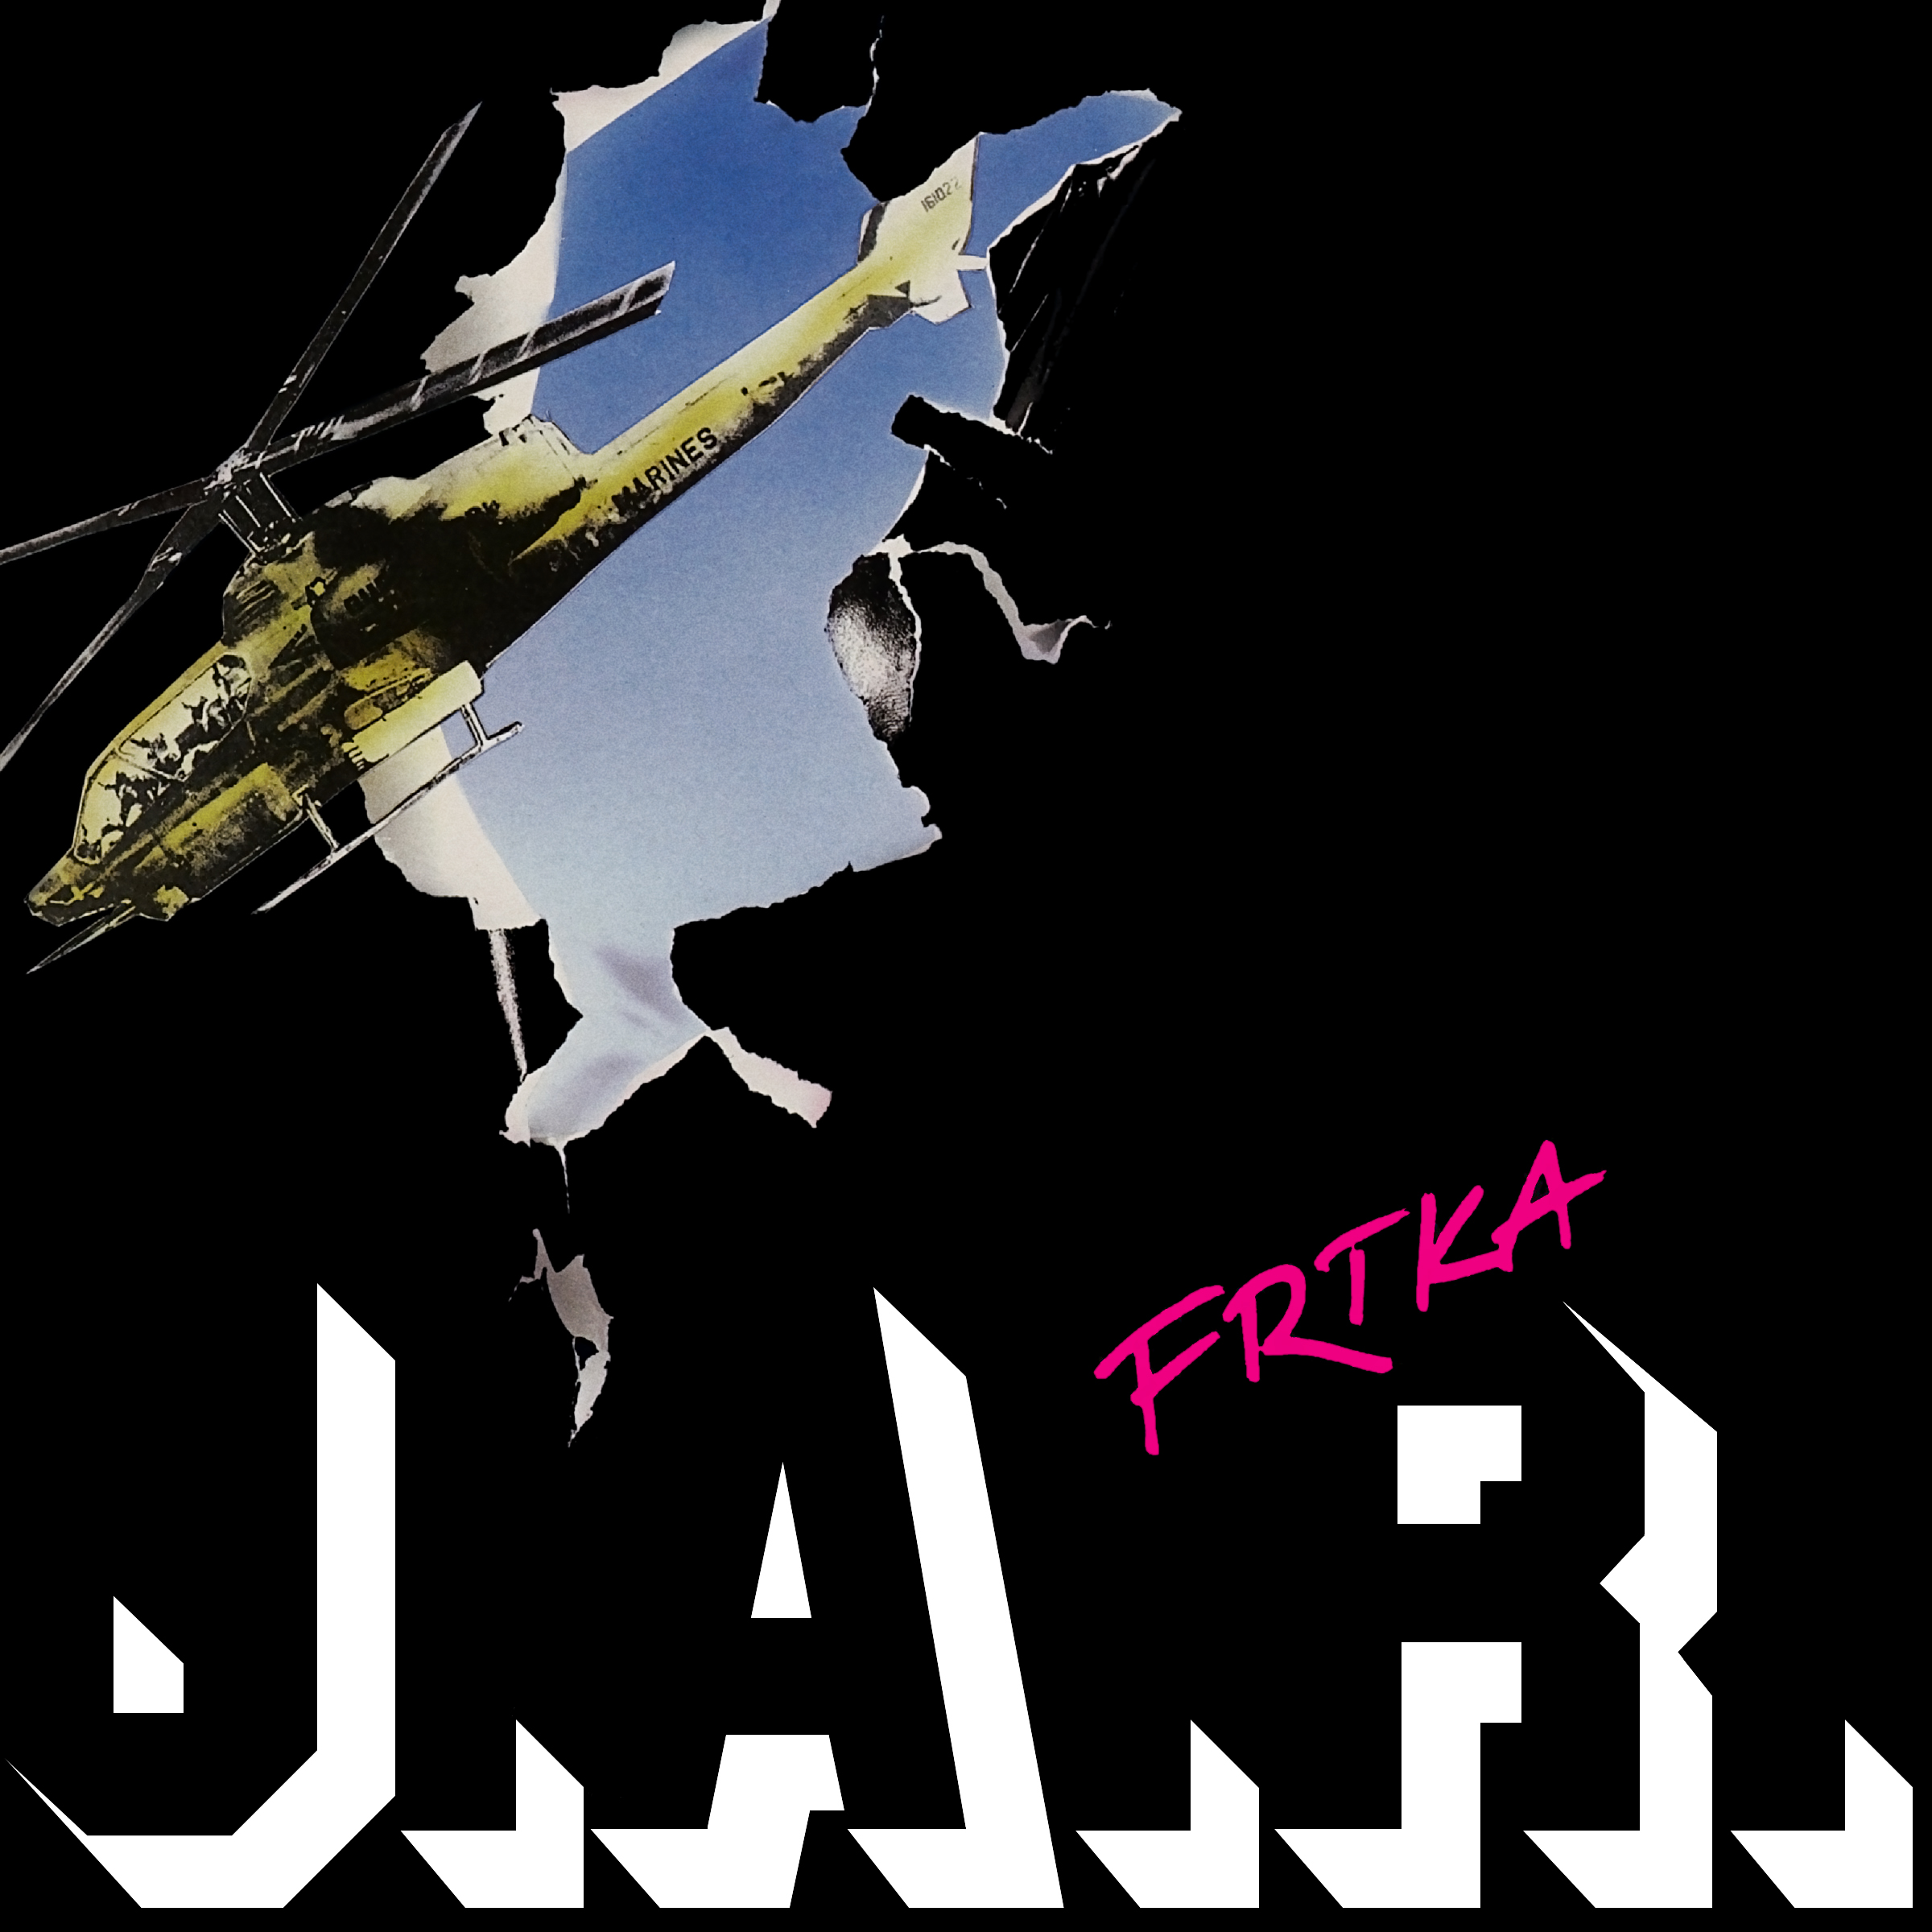 Album Artist: J.A.R. / Album Title: Frtka